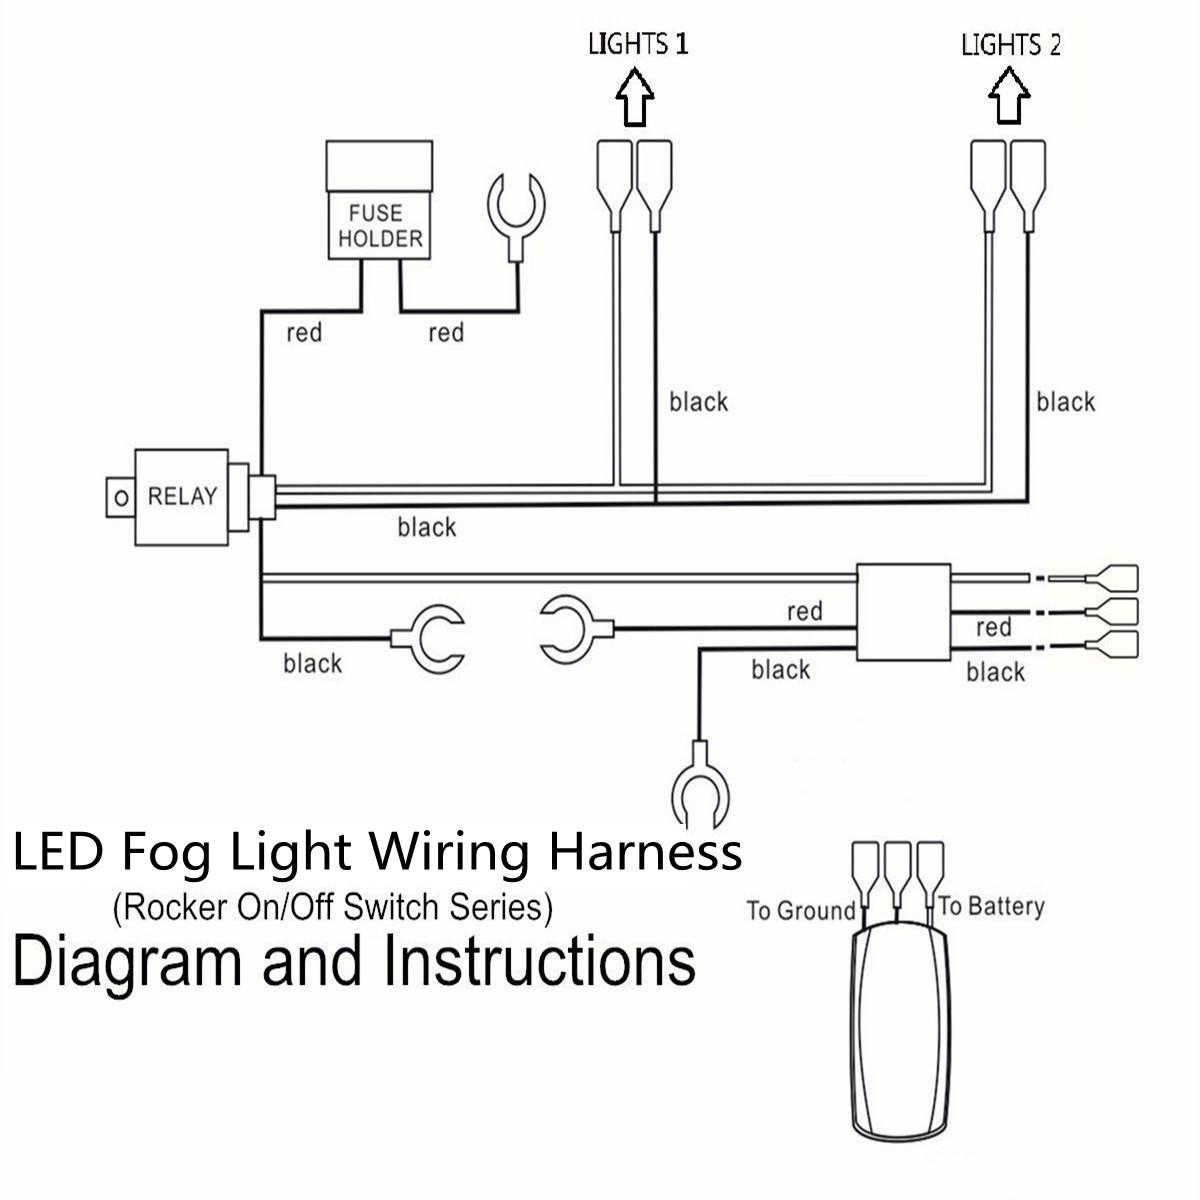 hight resolution of 12v 40a led fog light wiring harness laser rocker switch relay fuse kit